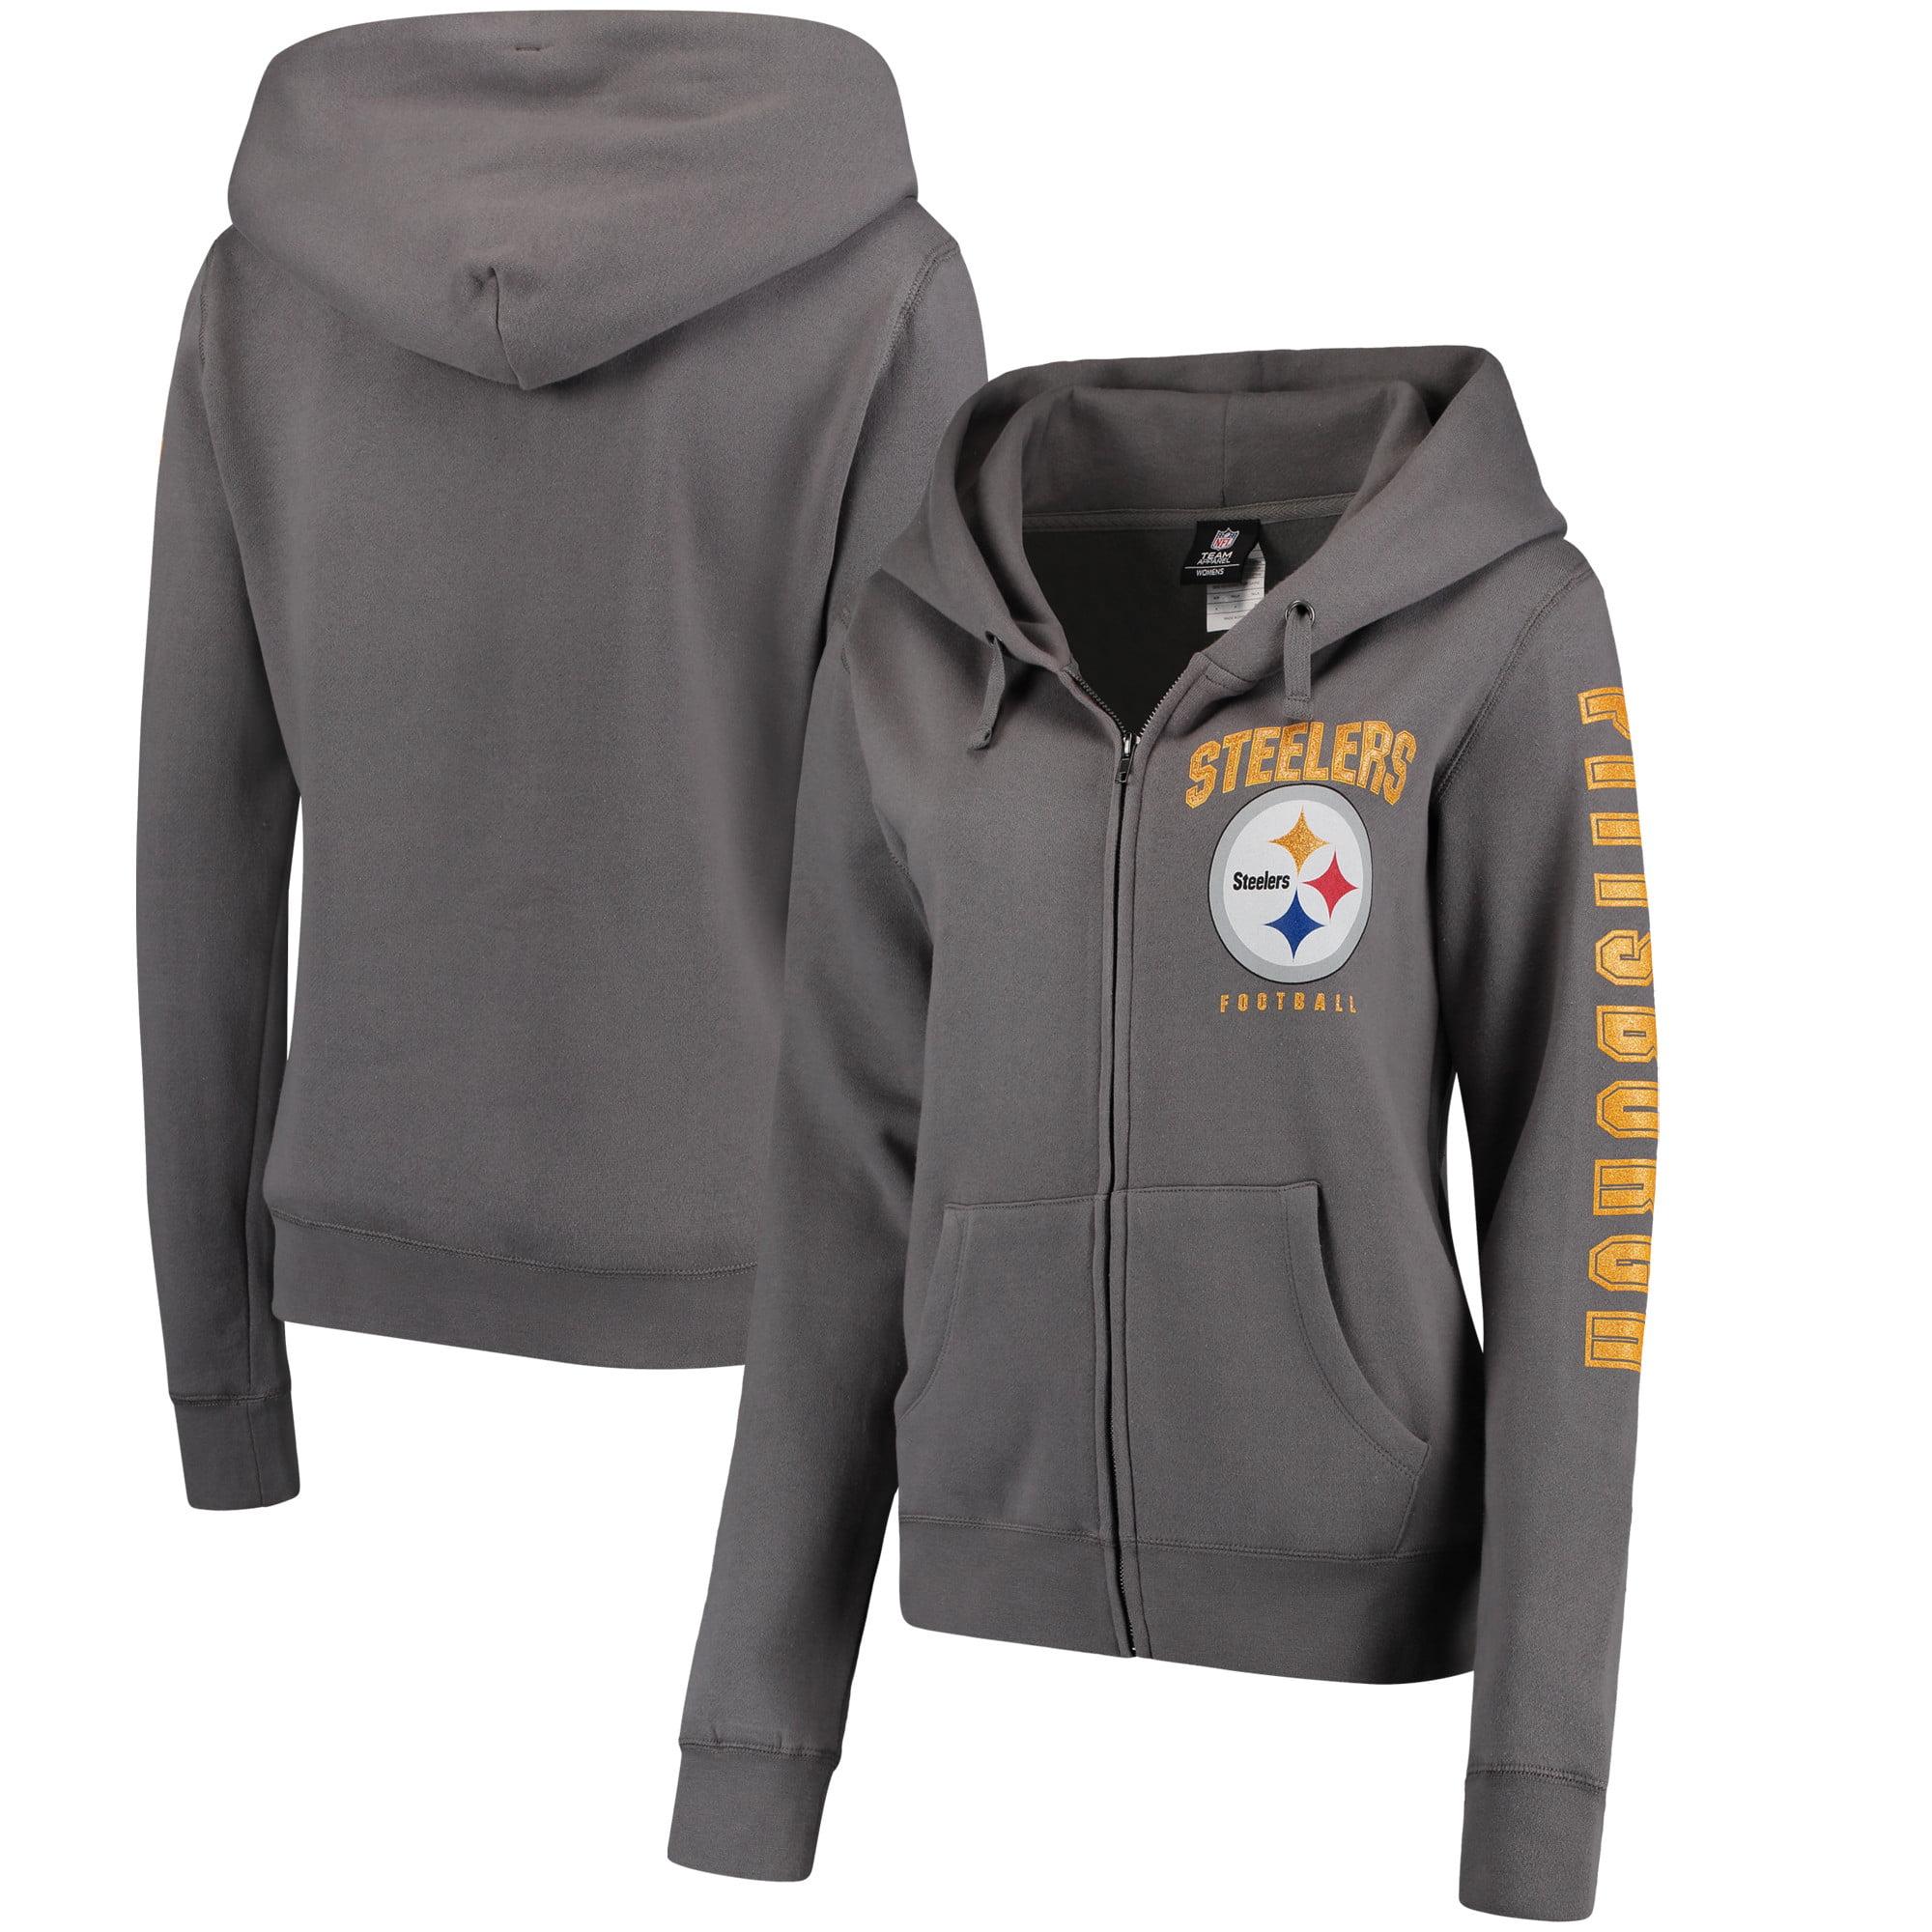 huge selection of 6b28b 62f90 Pittsburgh Steelers New Era Women's Playbook Glitter Sleeve Full-Zip Hoodie  - Gray